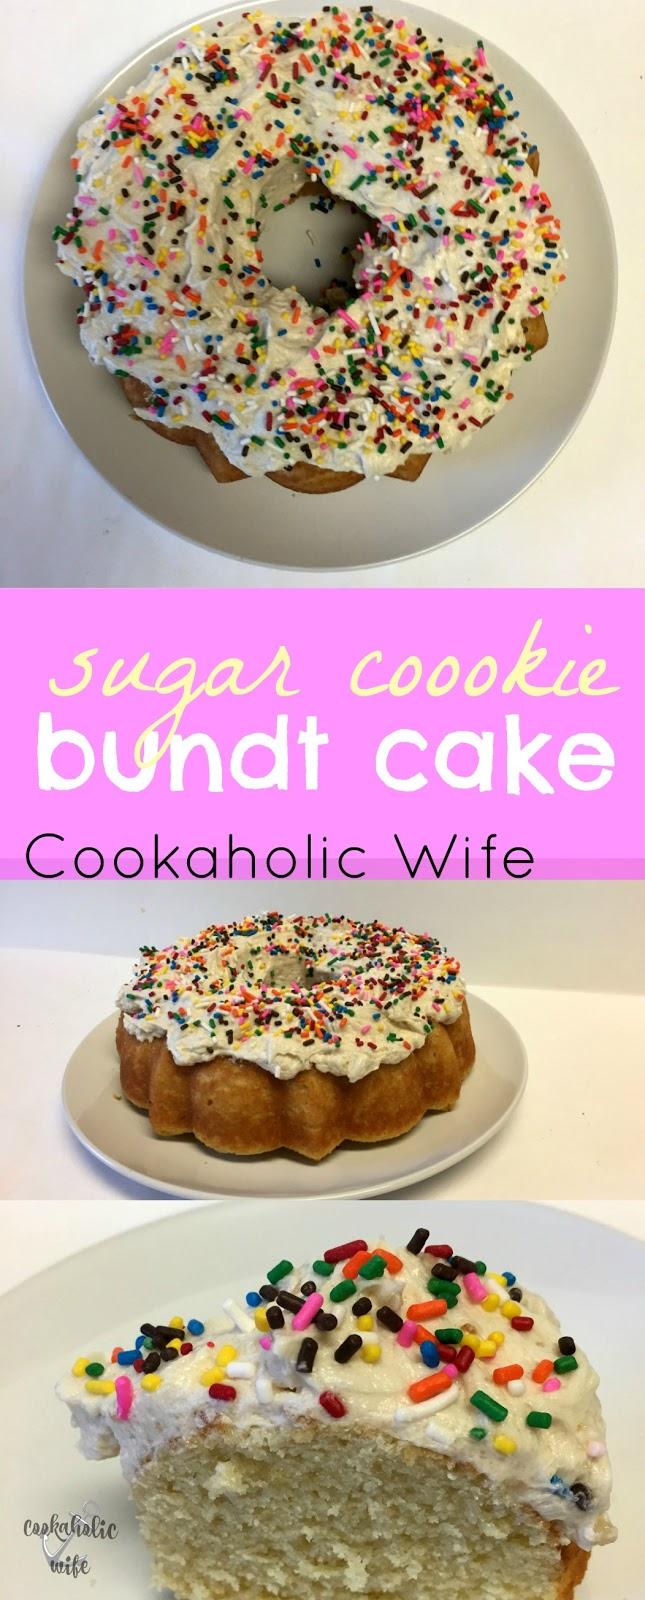 Wondrous Bundtbakers Sugar Cookie Bundt Cake Cookaholic Wife Personalised Birthday Cards Akebfashionlily Jamesorg